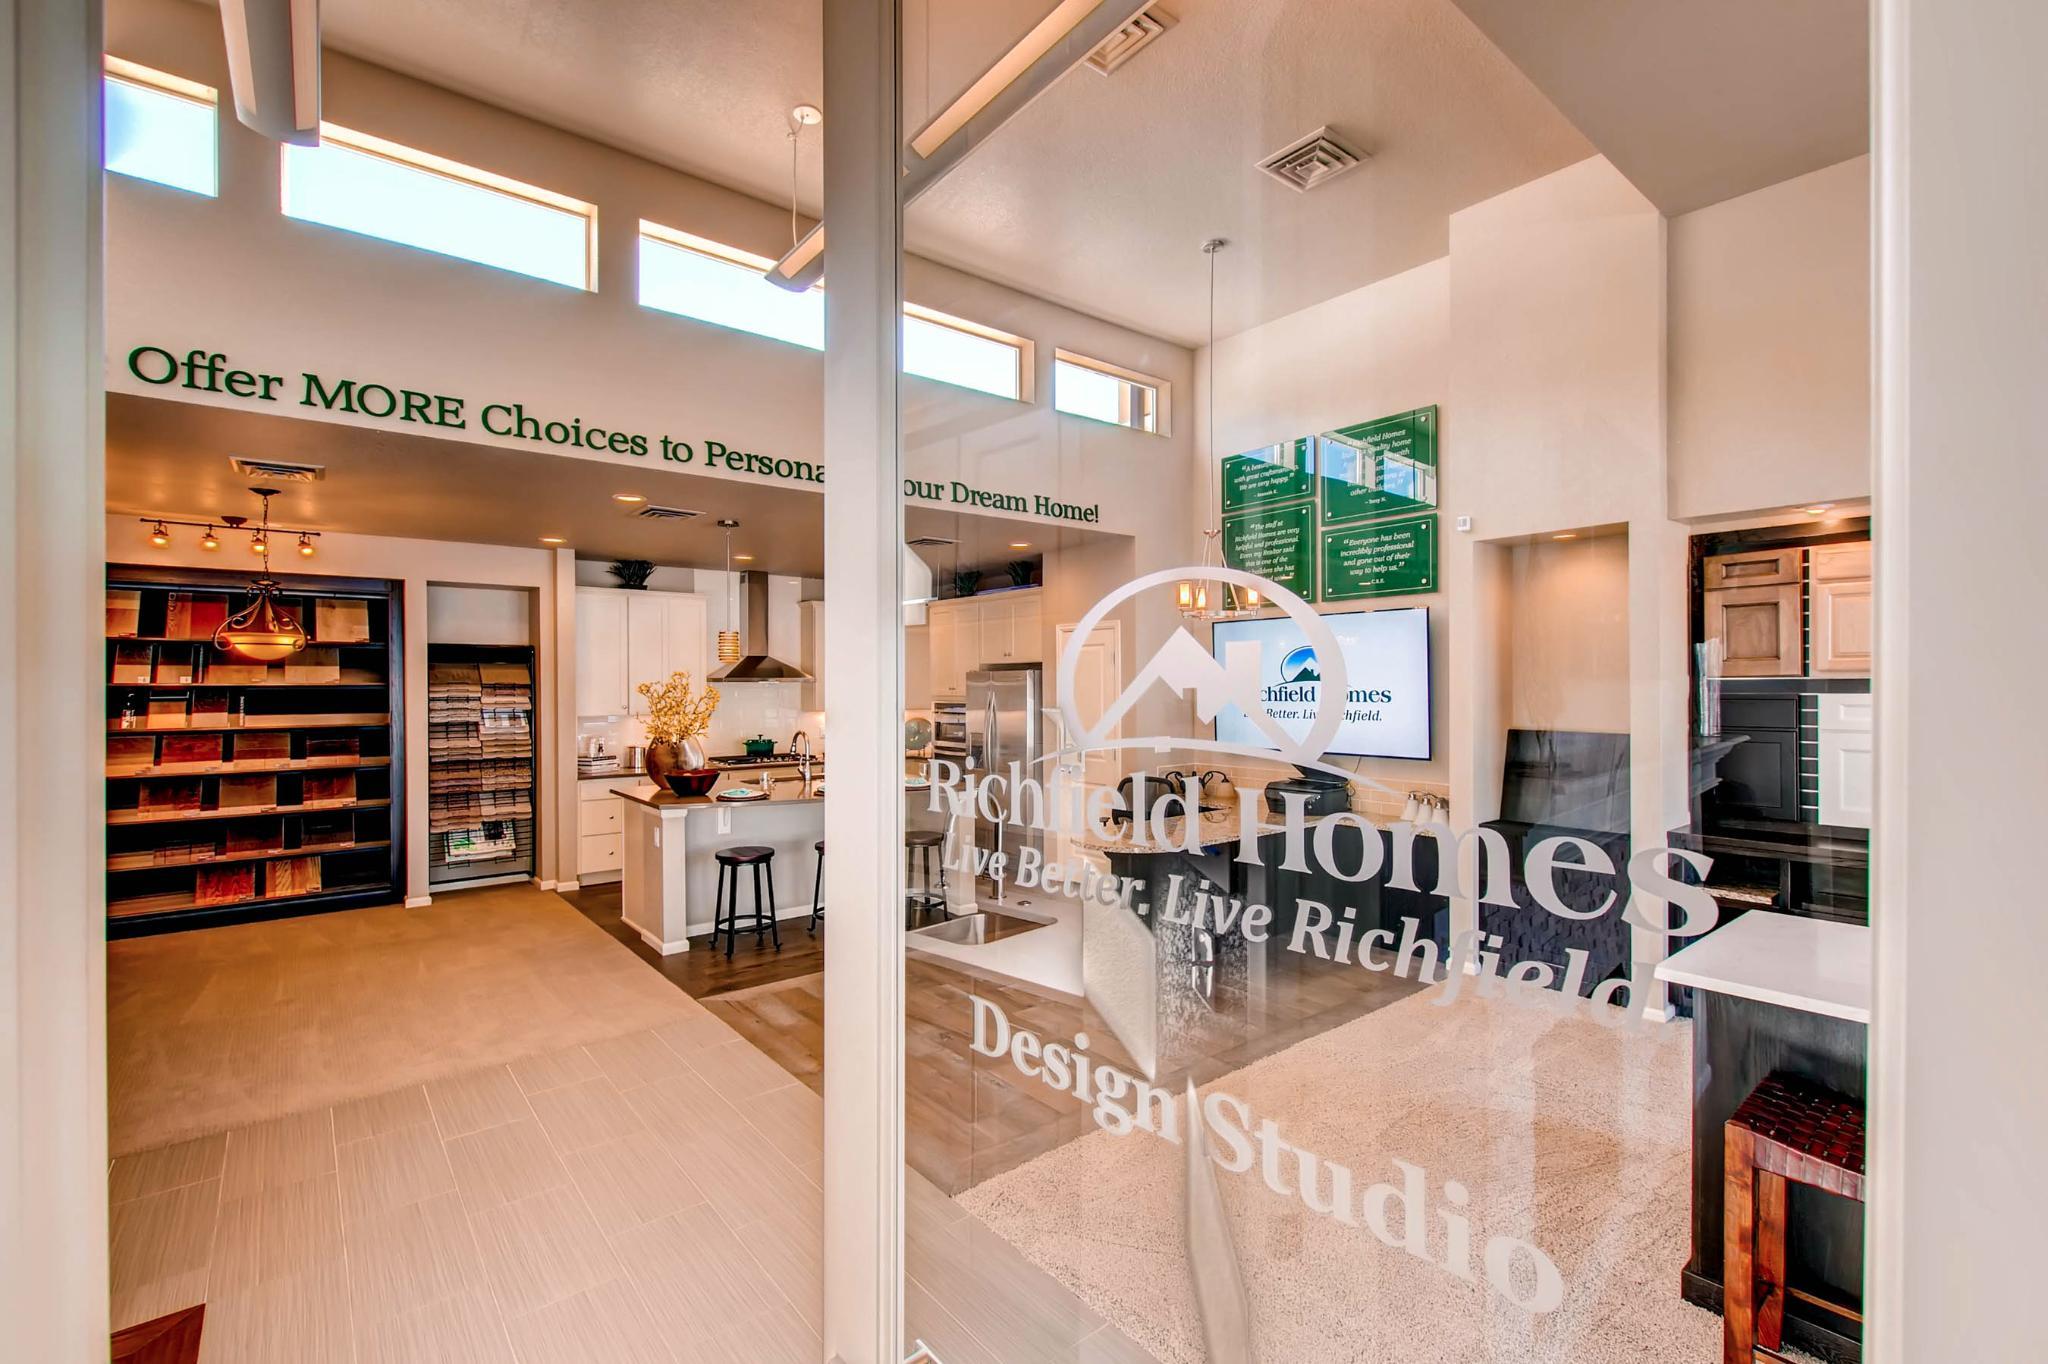 Design Center Photo Gallery